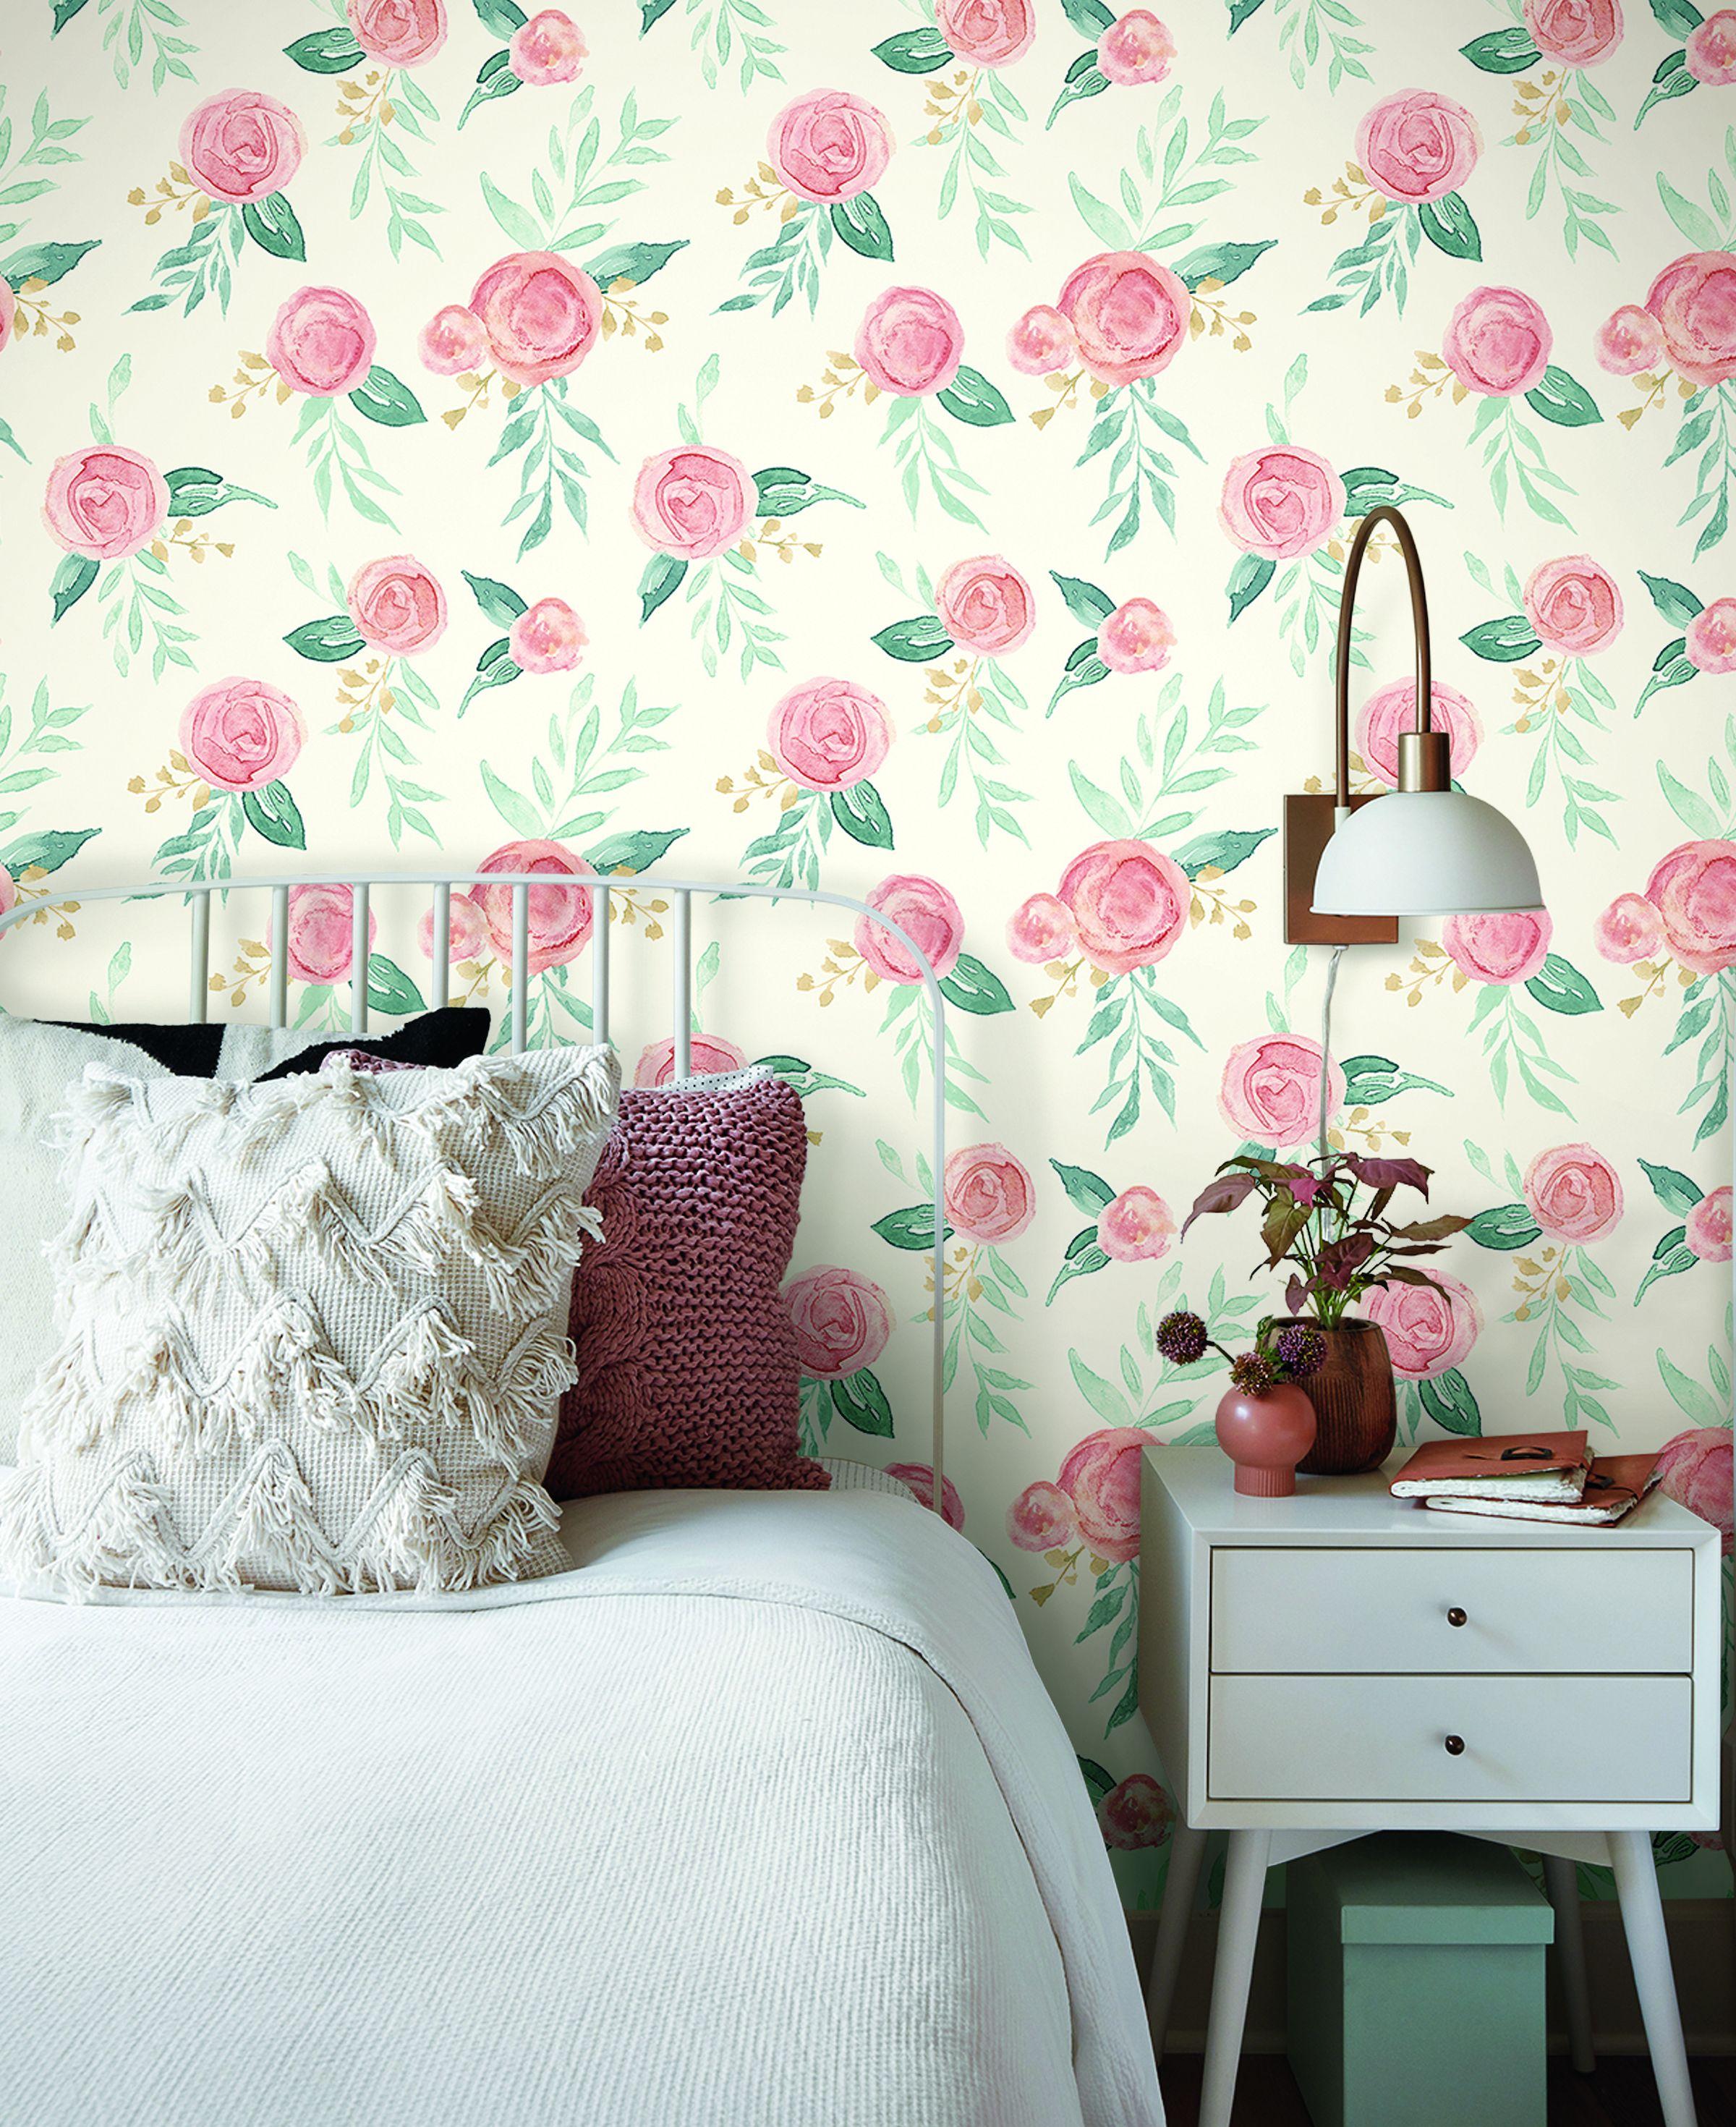 MK1126 1   Home wallpaper, Magnolia homes, Peel and stick ...